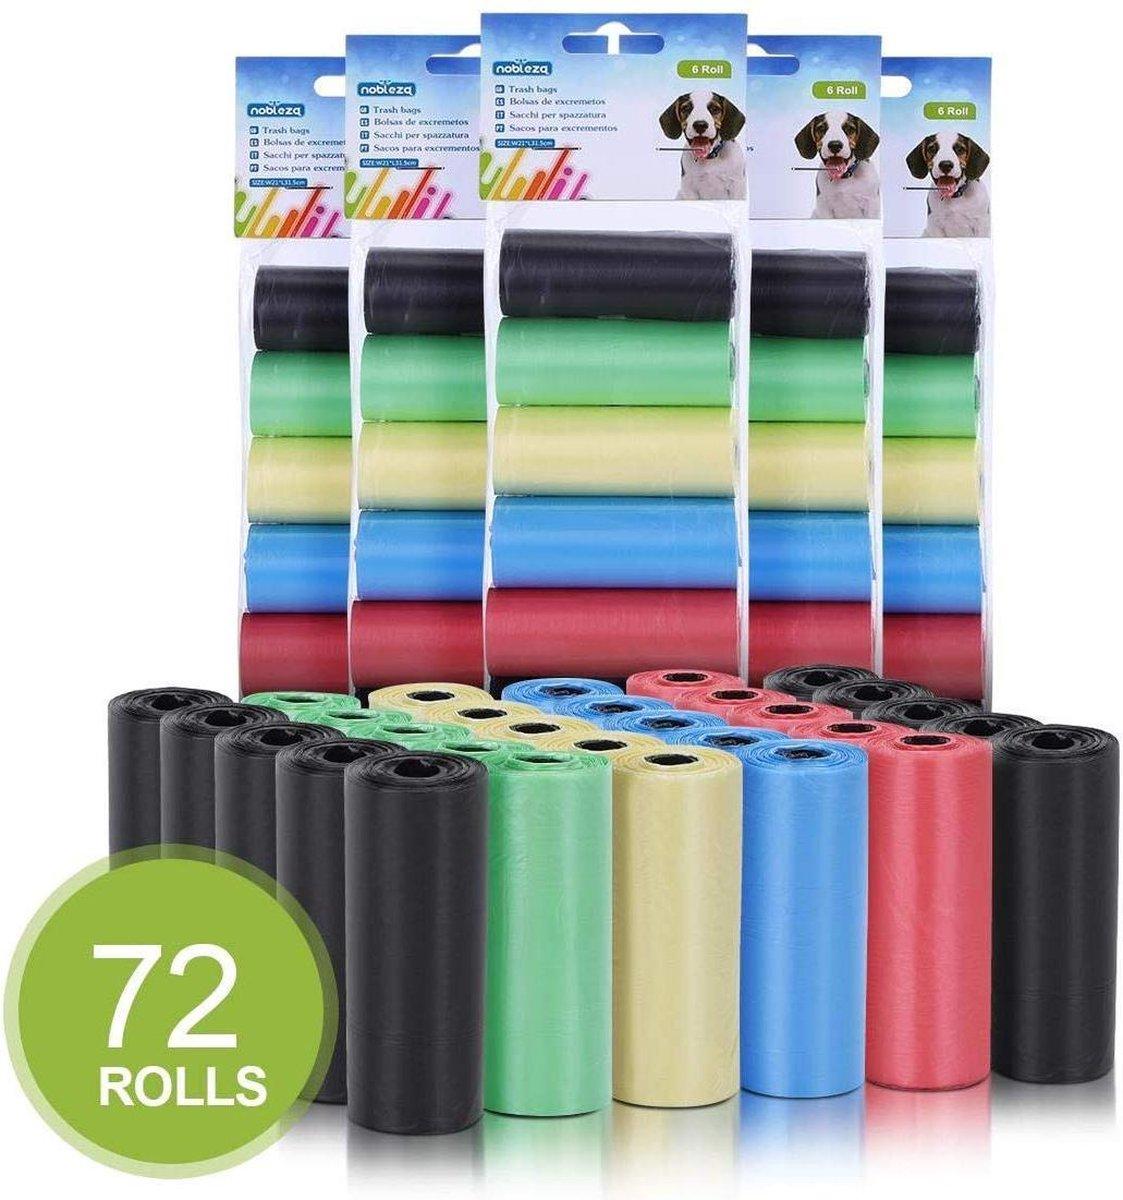 Nobleza Hondenpoepzakjes - 72 Rollen - 21 x 31.5 cm - Gekleurd kopen